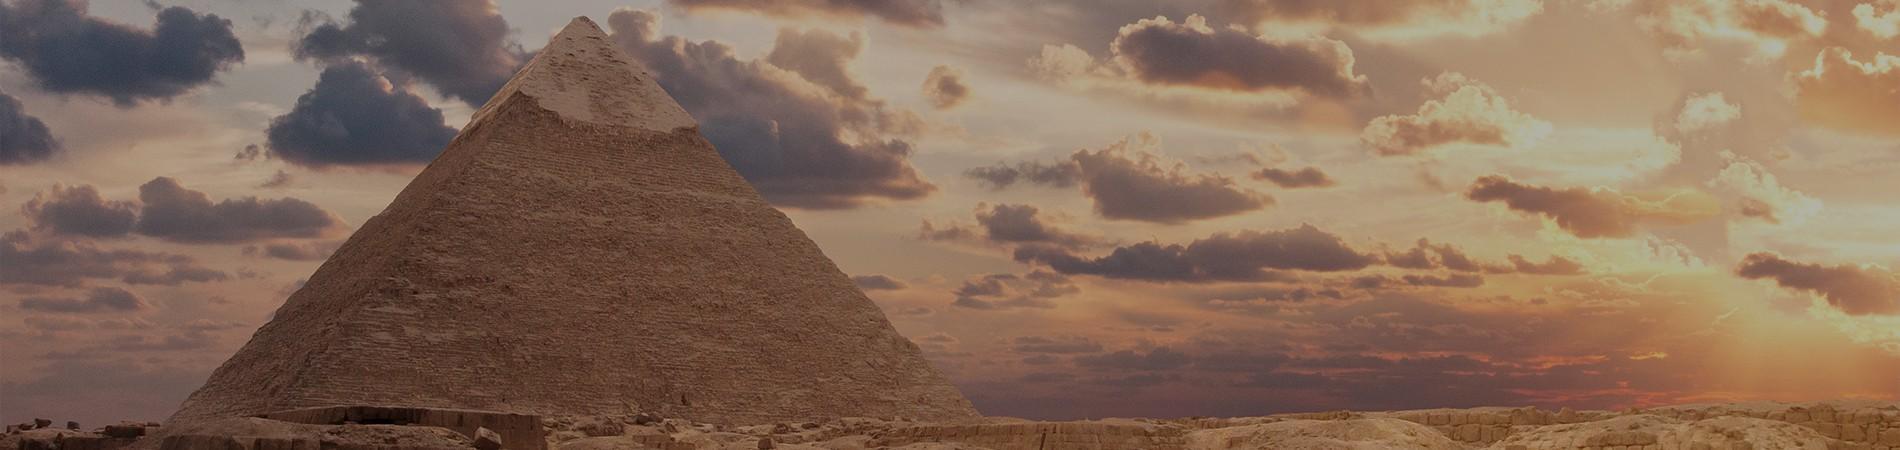 Hatshepsut Egypt Tours